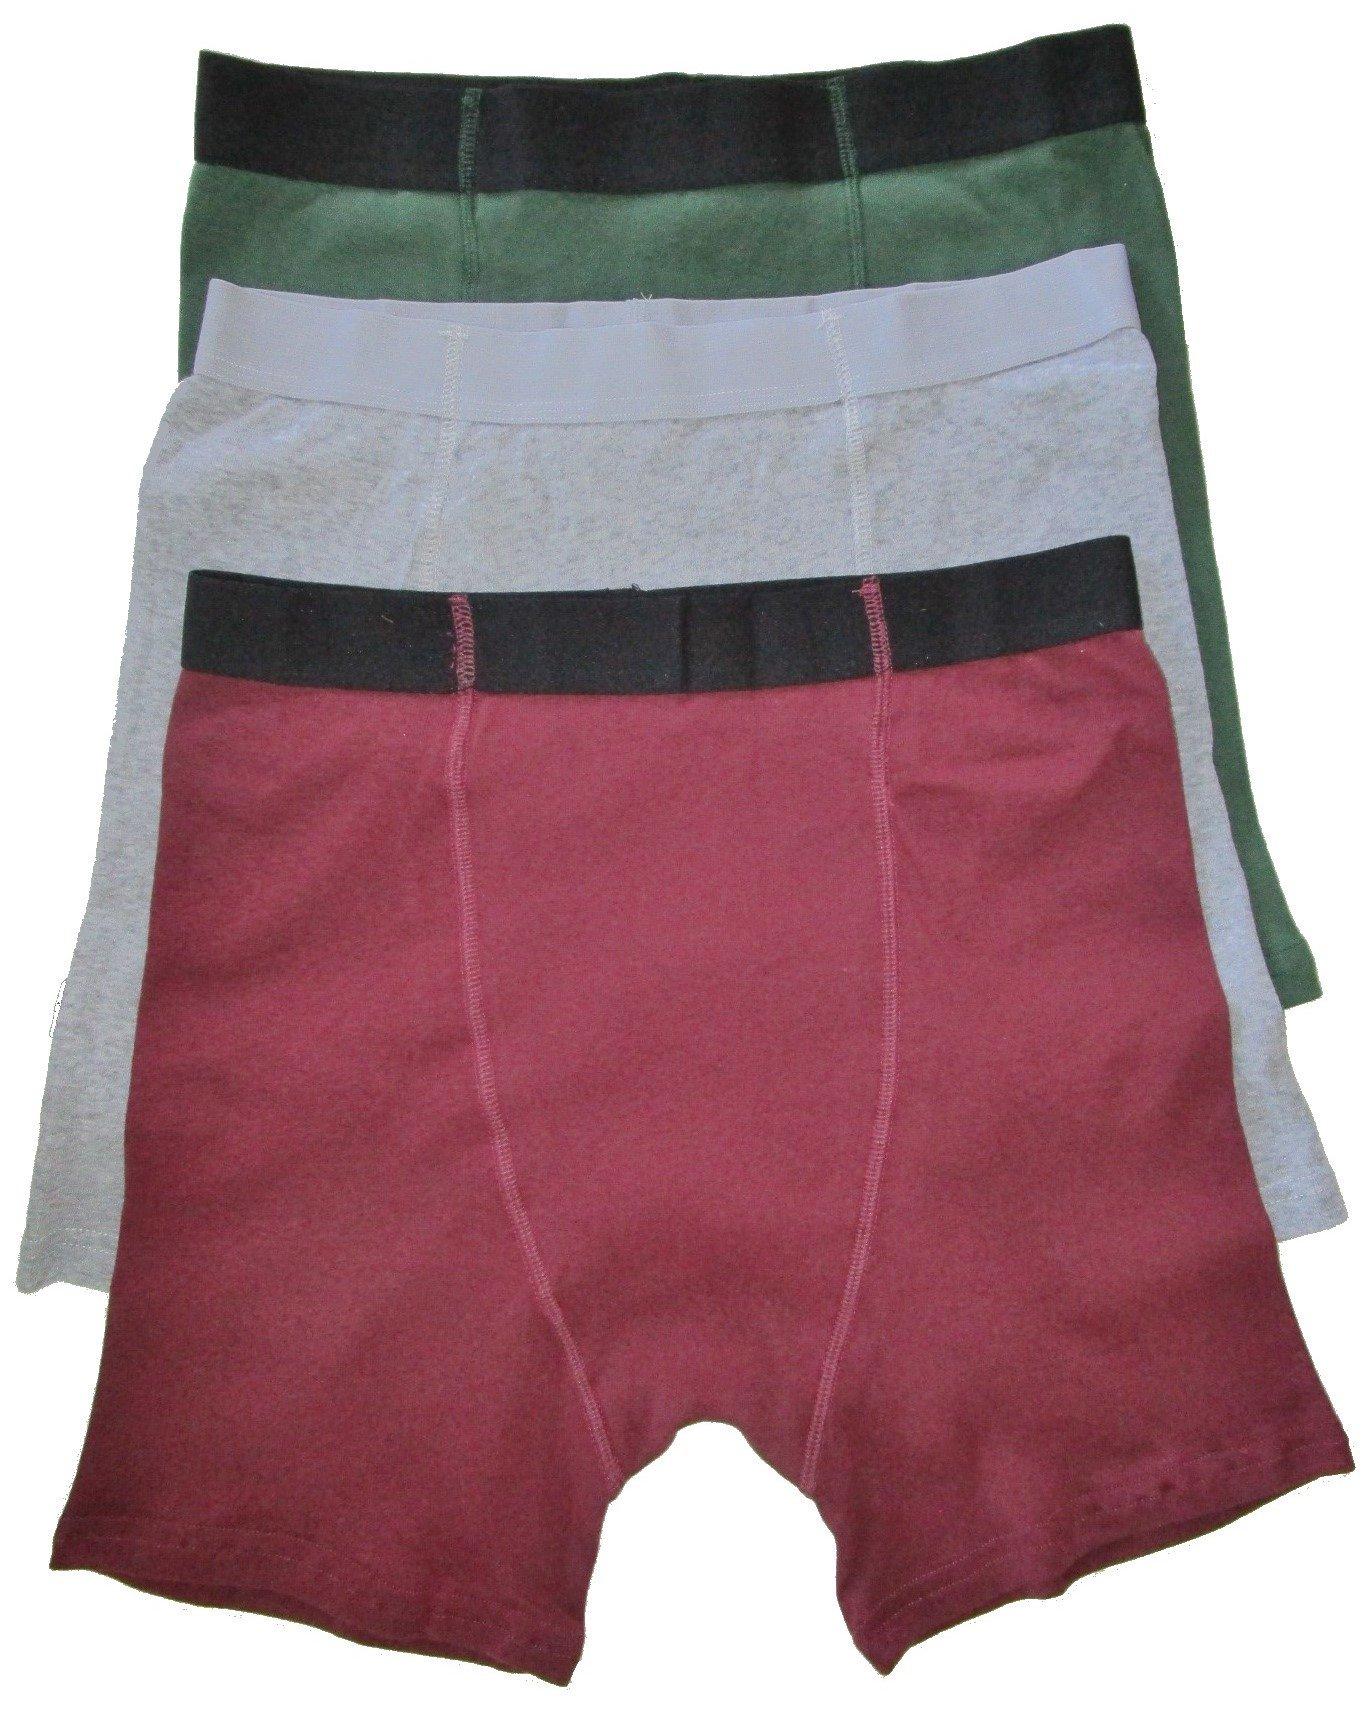 Stashitware Medium Red, Gray, Green Mens Hidden Stash Pocket Underwear.1 ea.